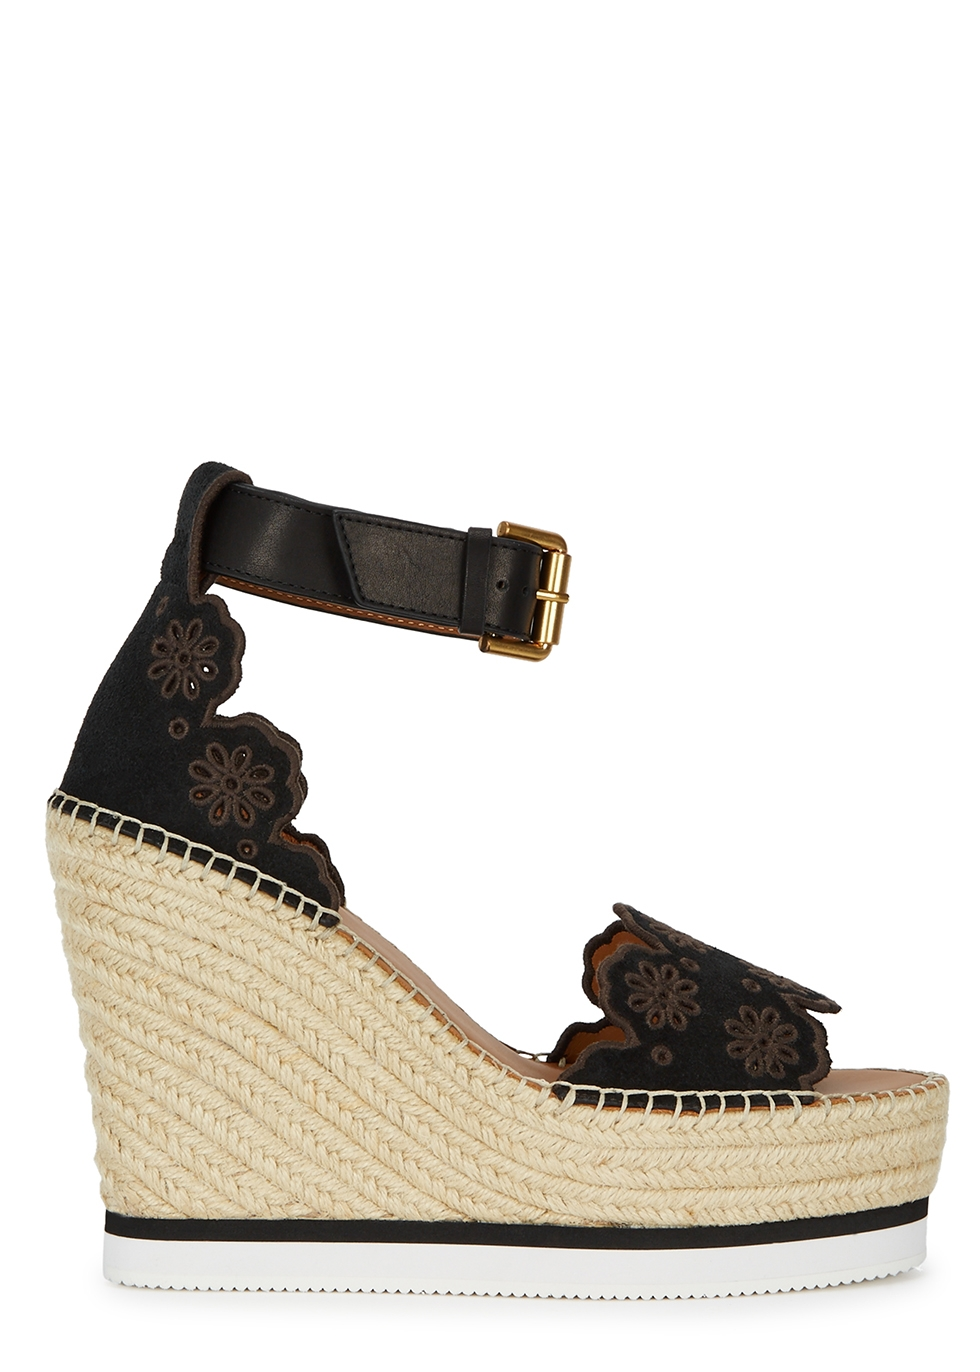 deda41364e5 Women s Designer Wedge   Platform Sandals - Harvey Nichols